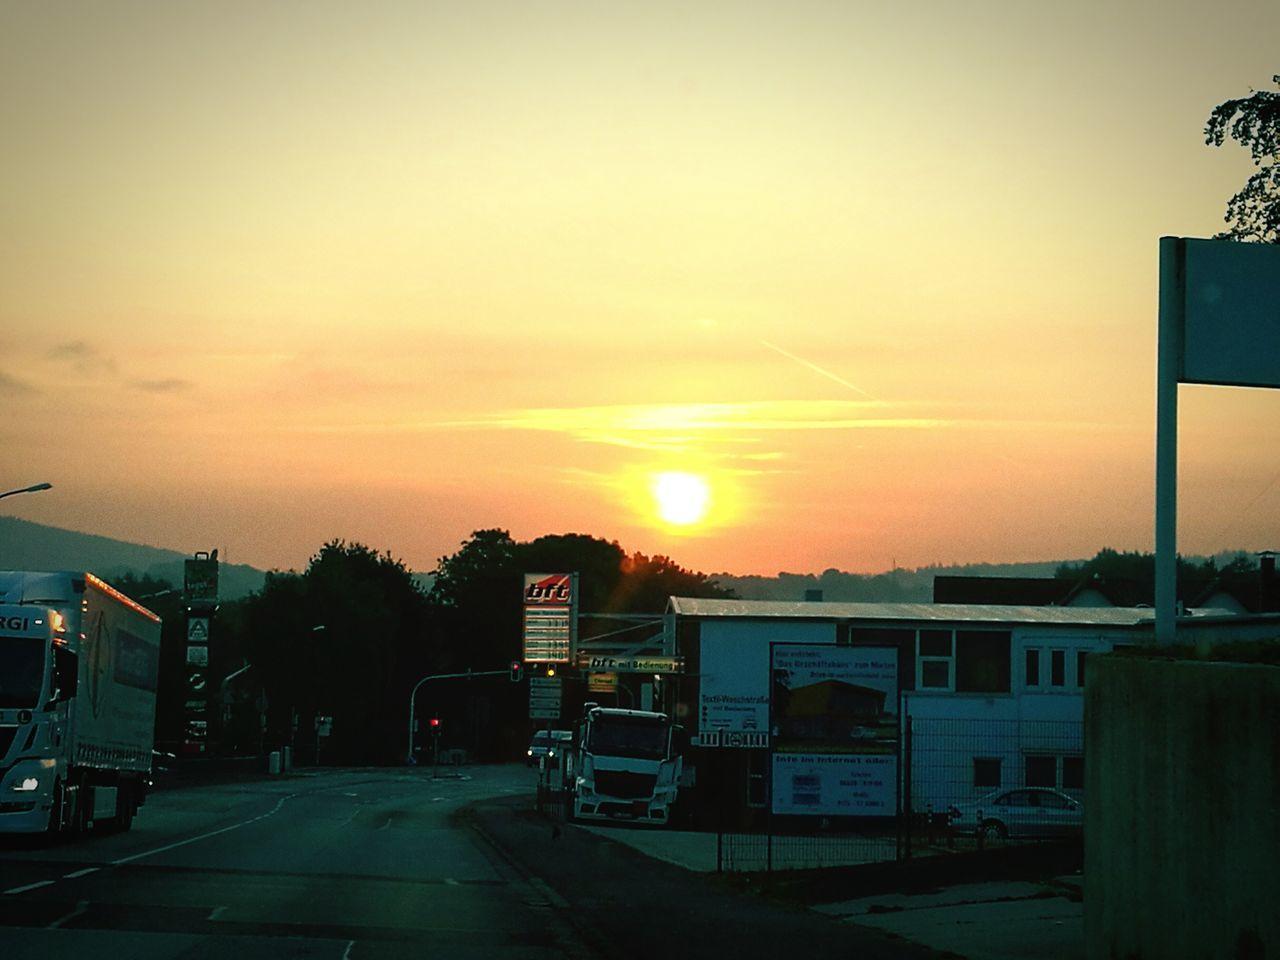 Sonnenaufgang in unserer schönen Kleinstadt. Sunset Sun Orange Color Sky Cloud - Sky The Way Forward Outdoors Beauty In Nature First Eyeem Photo